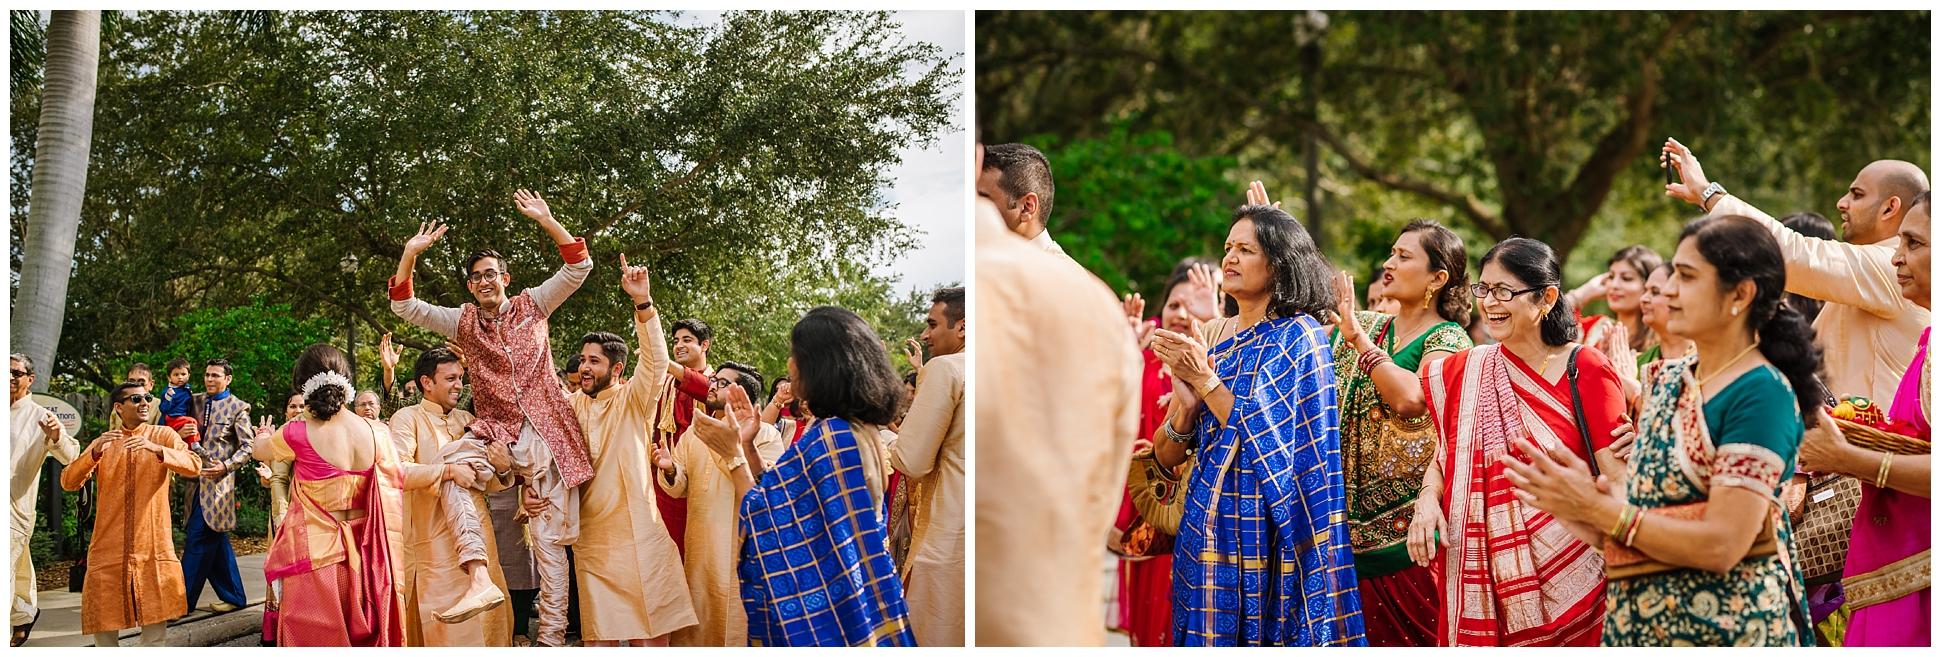 St-pete-indian-wedding-photographer-barat-sunken-gardens_0109.jpg